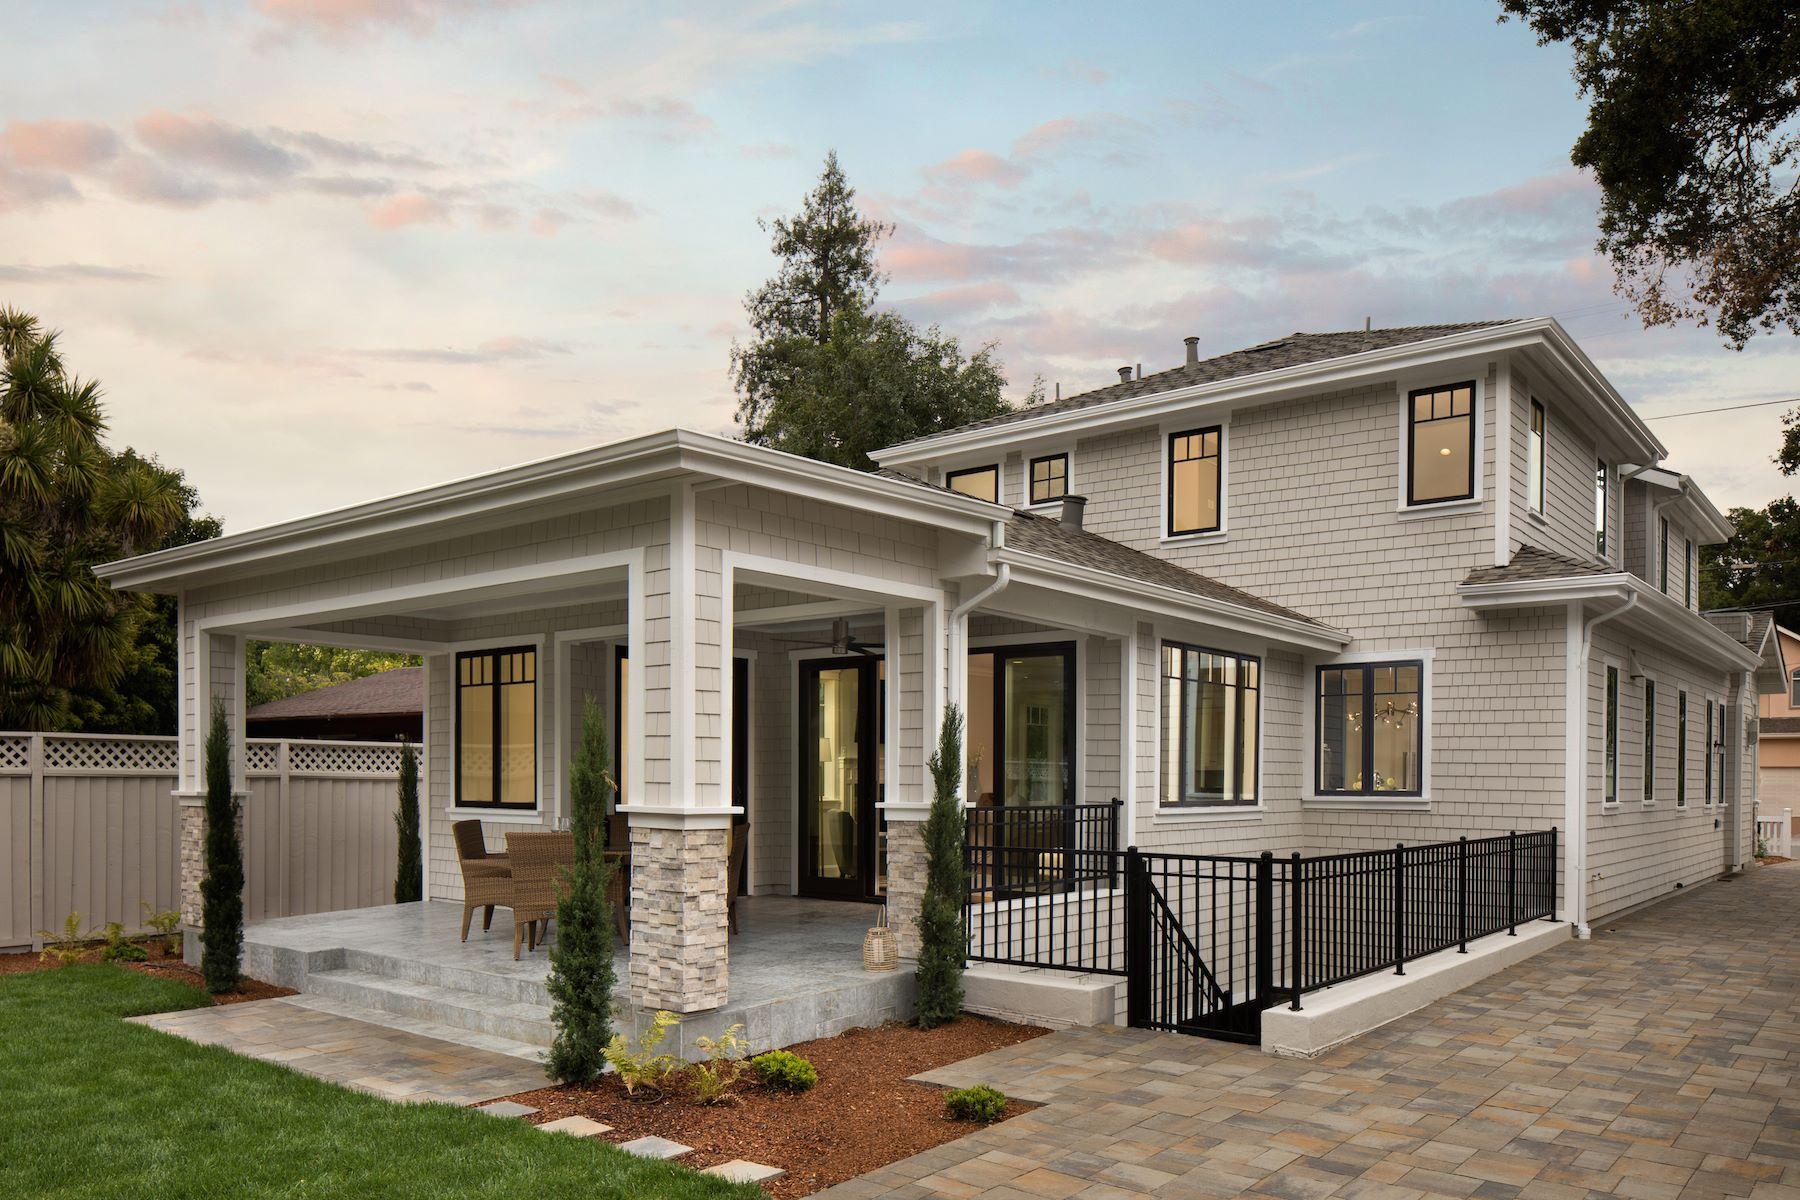 Additional photo for property listing at 151 Kellogg Ave 151 Kellogg Ave. Palo Alto, California 94301 United States